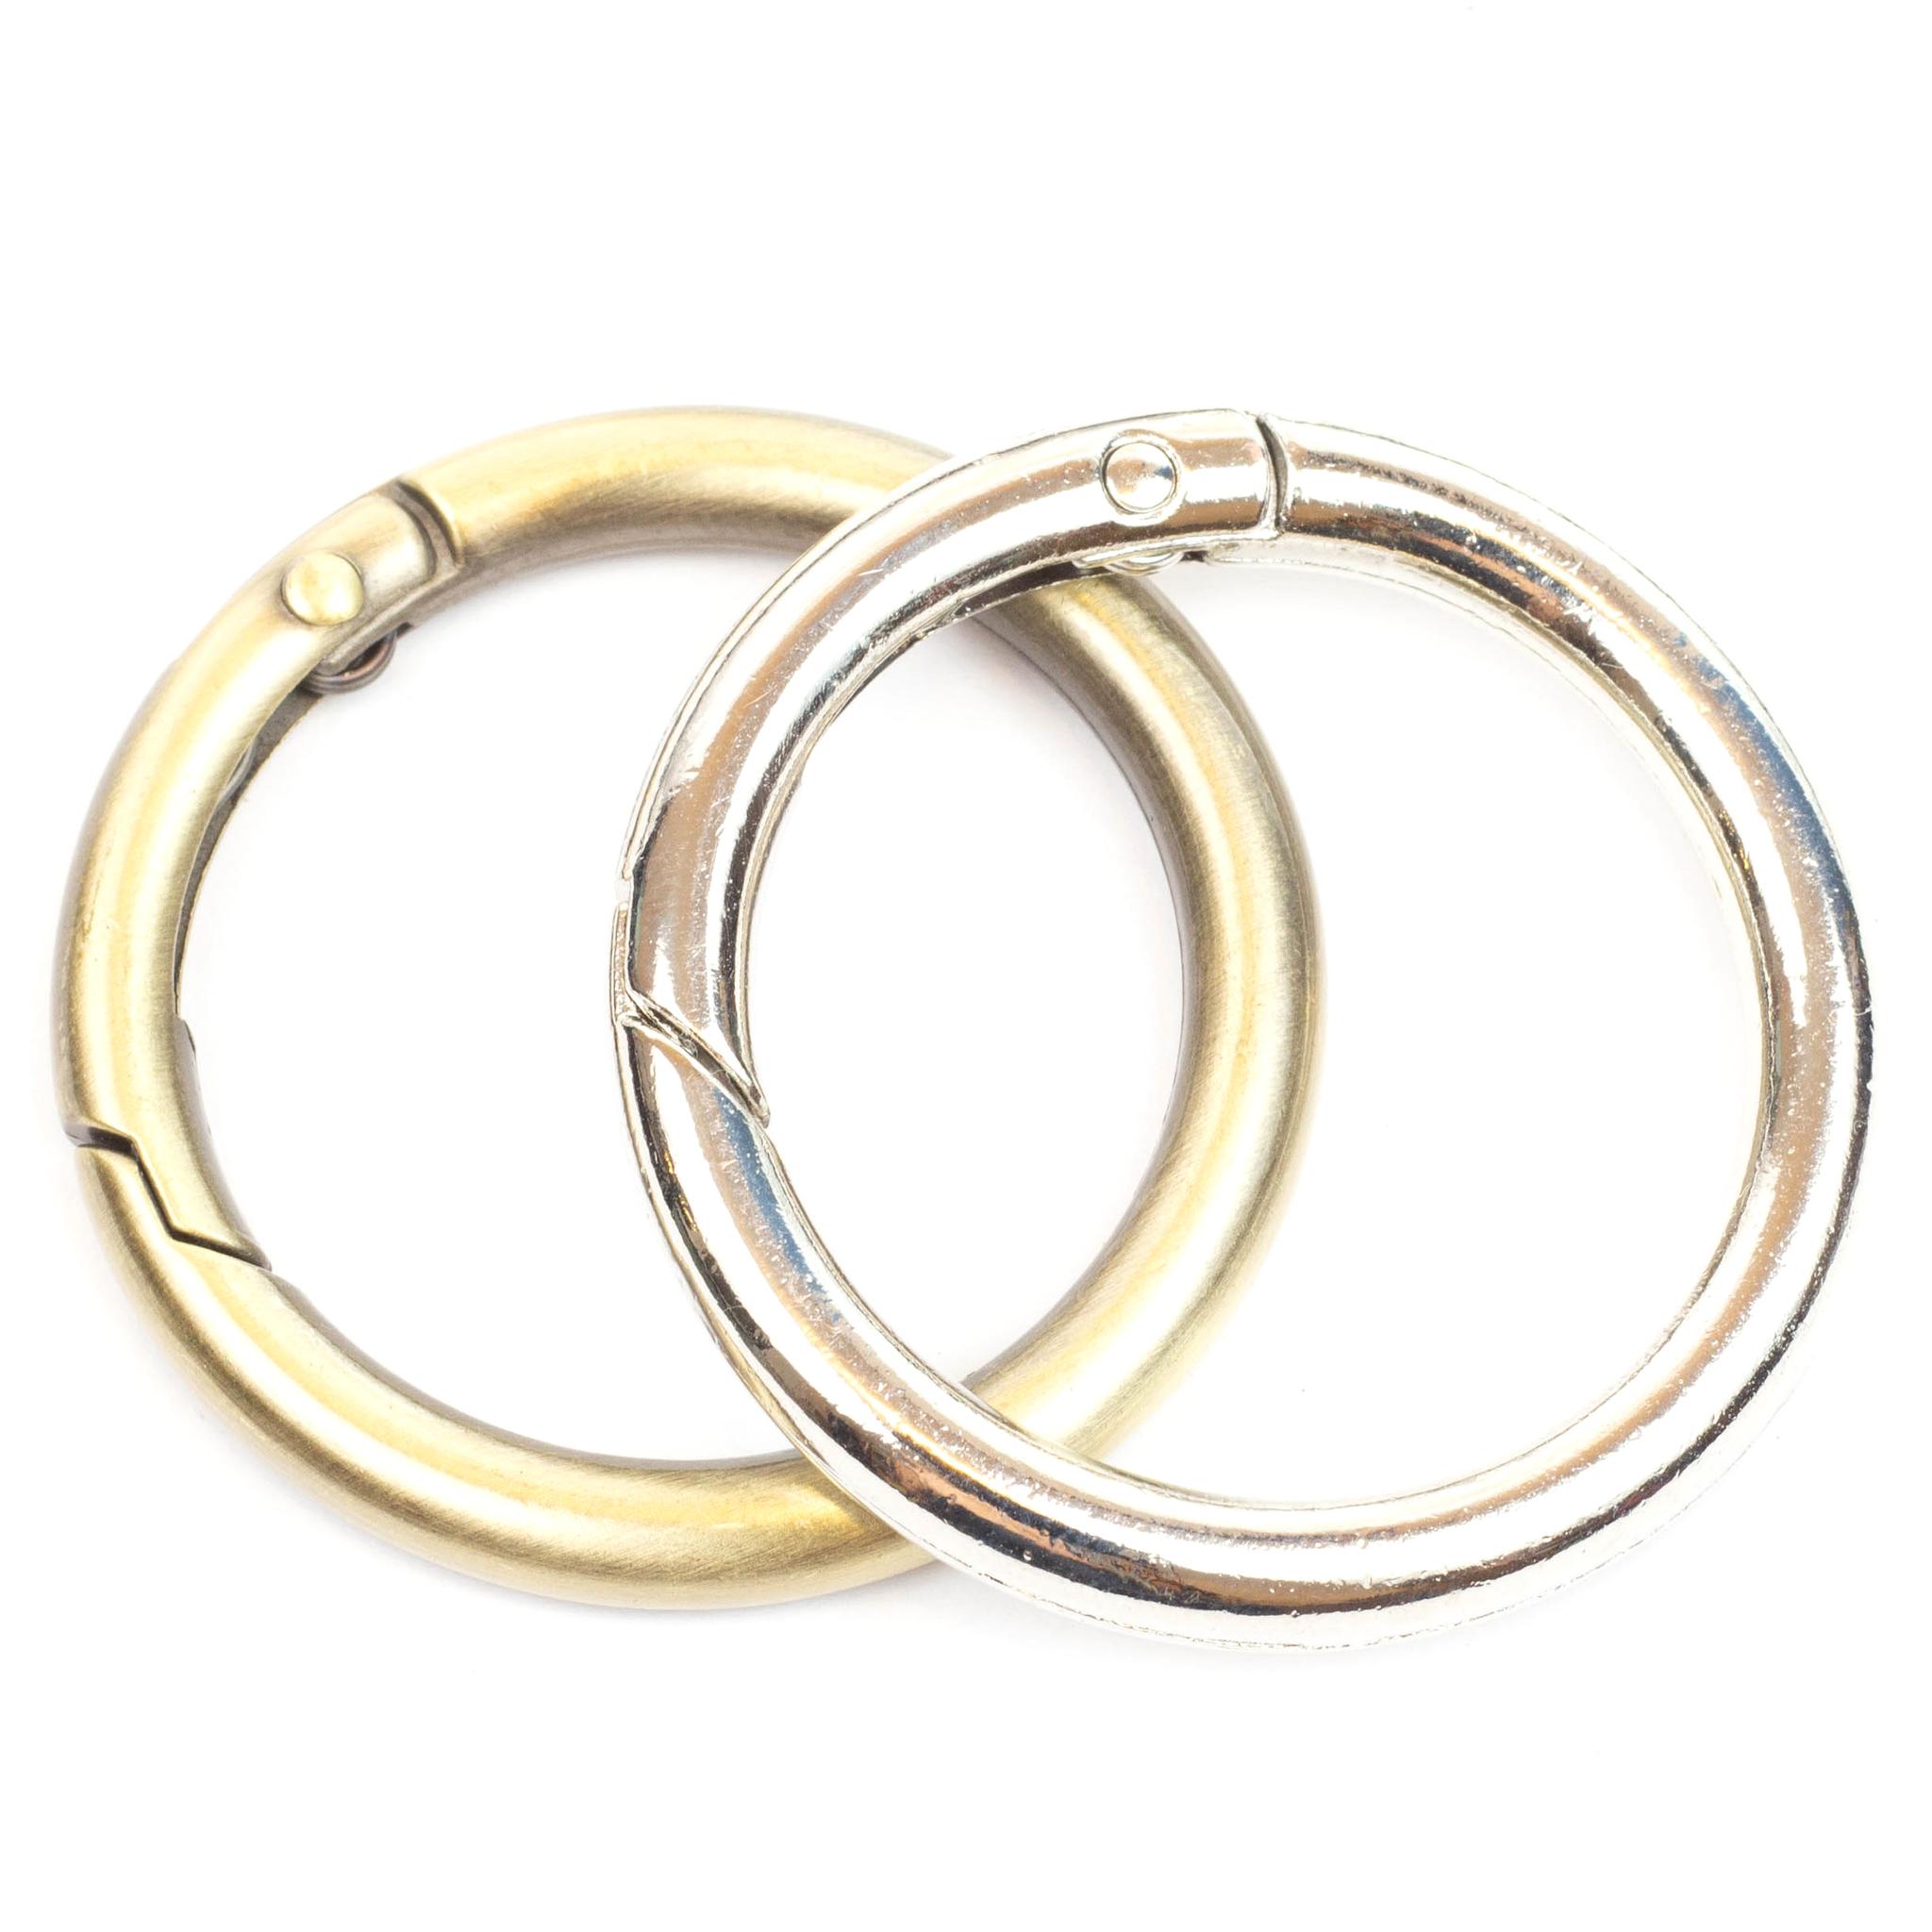 Карабины Карабин-кольцо 31мм  (цвет на выбор) IMG_0020_1.jpg